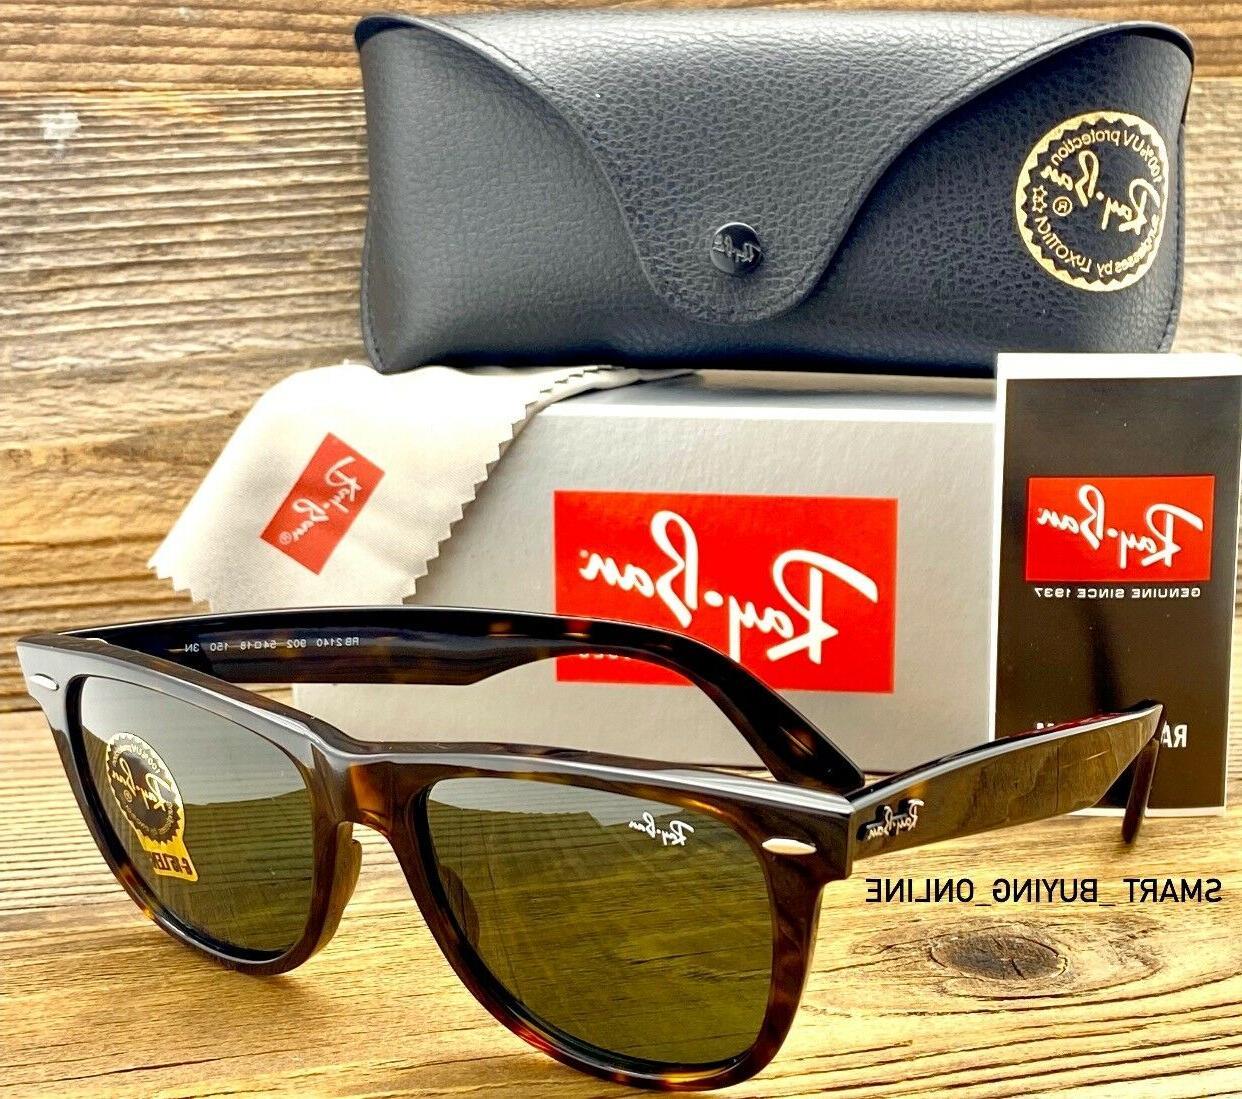 Ray Ban Original Wayfarer Tortoise Non Polarized Sunglasses